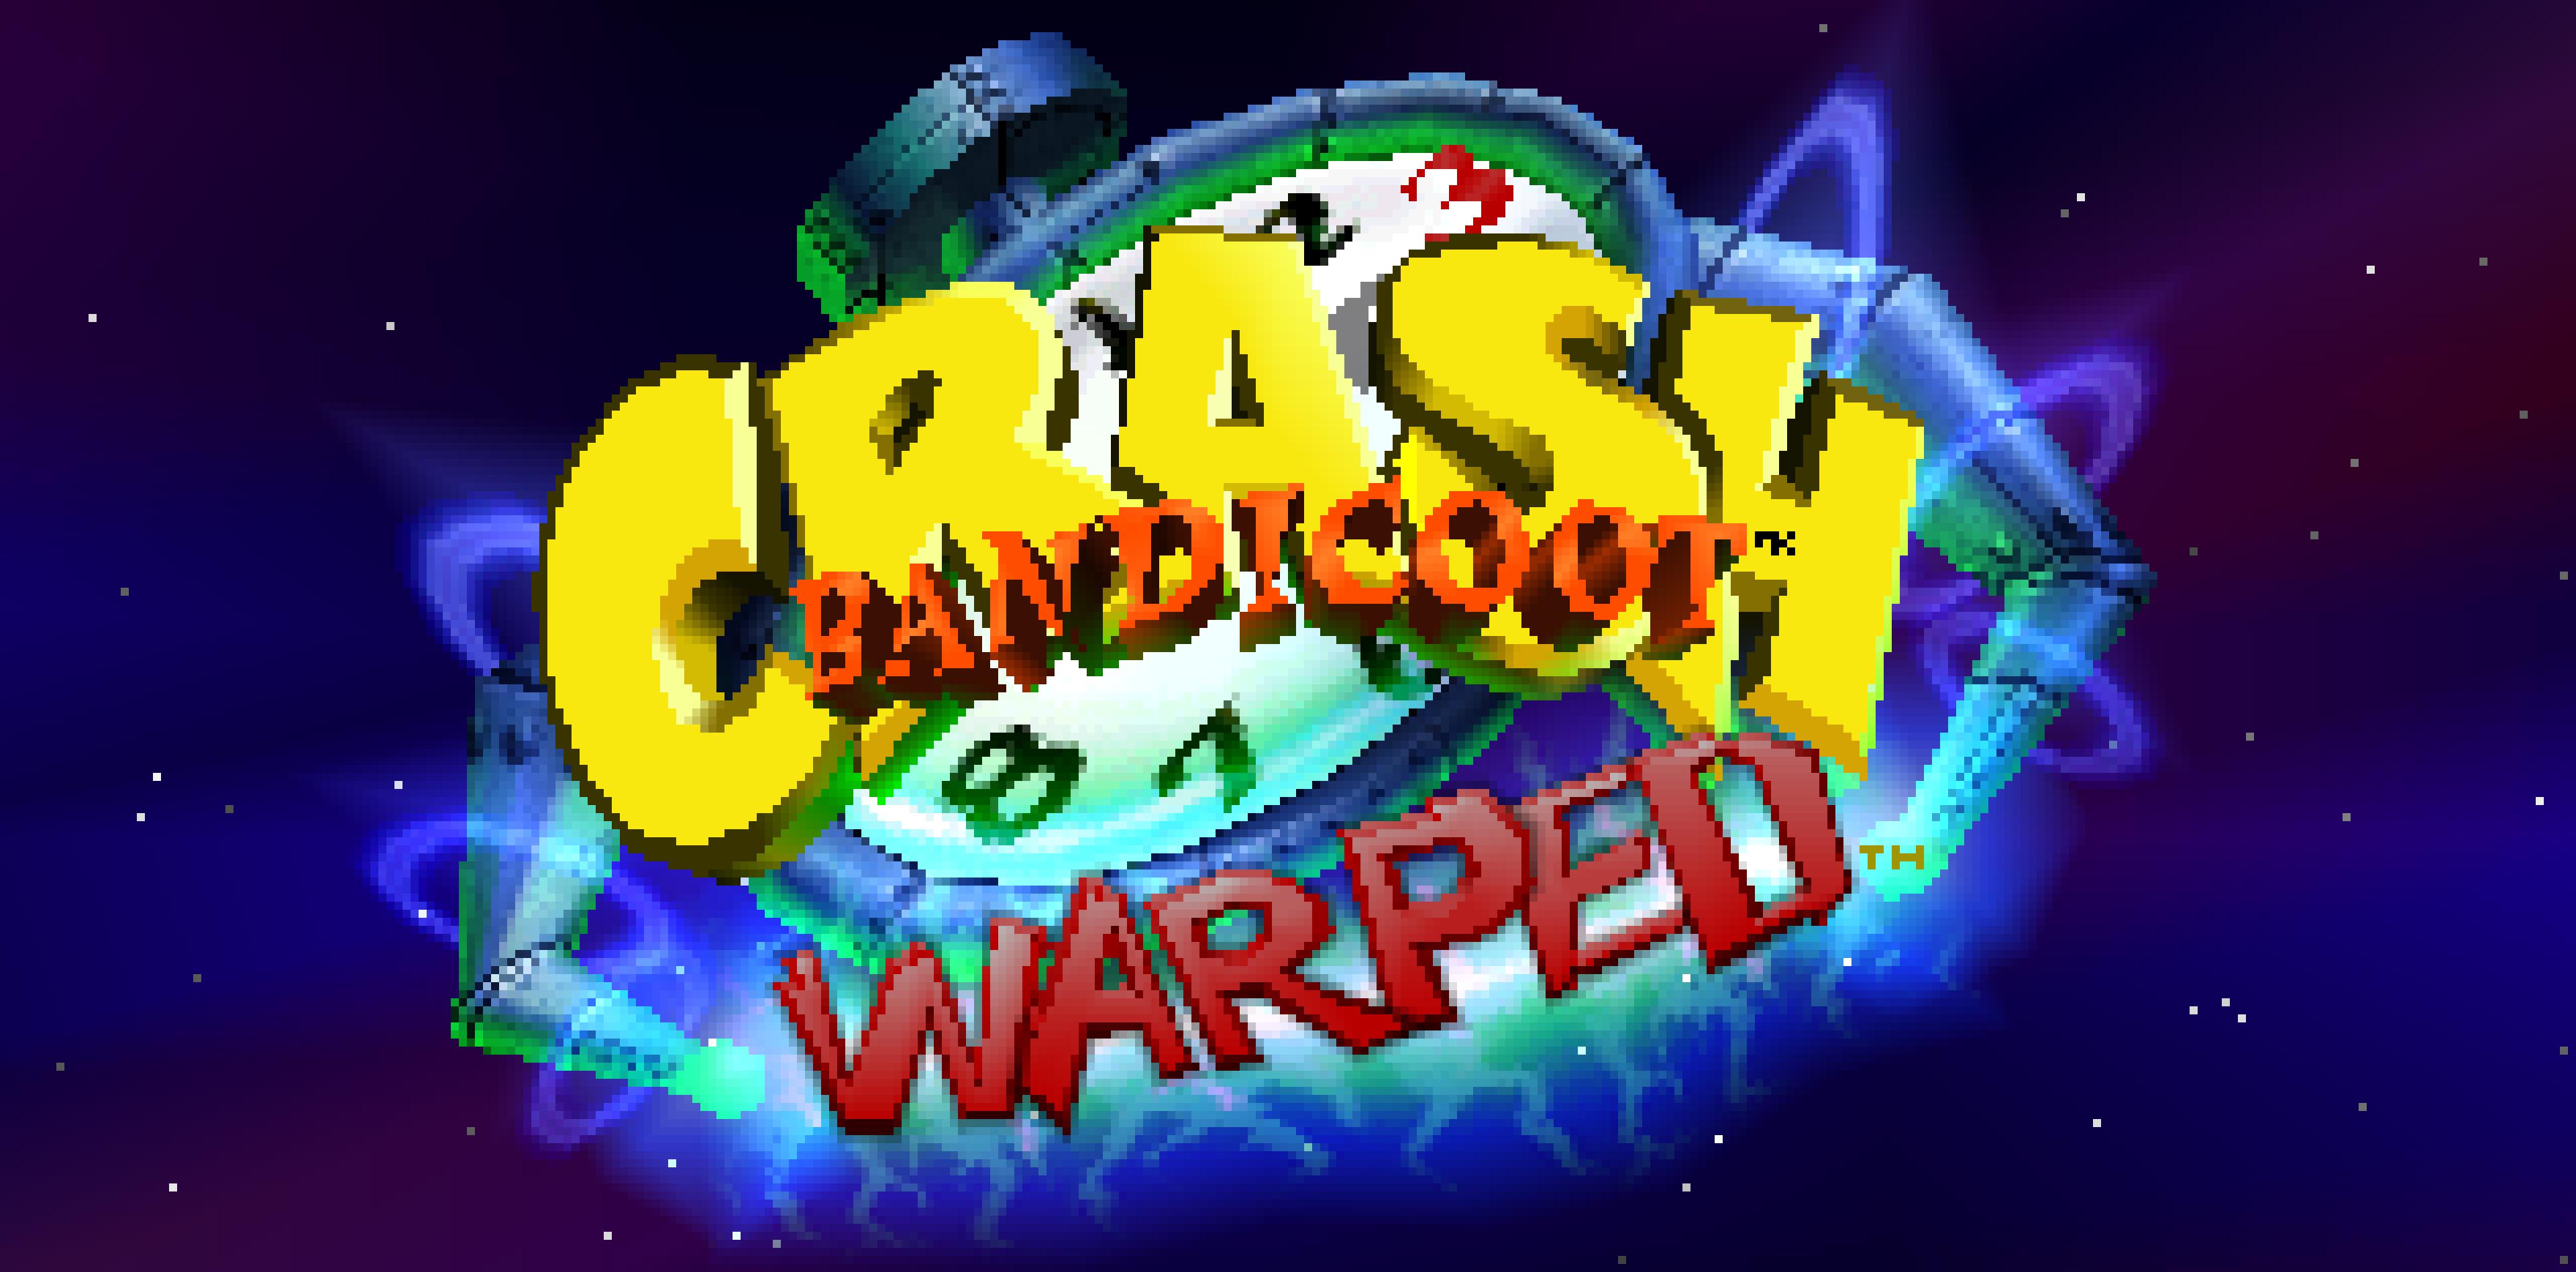 Crash Bandicoot: Warped's title screen.